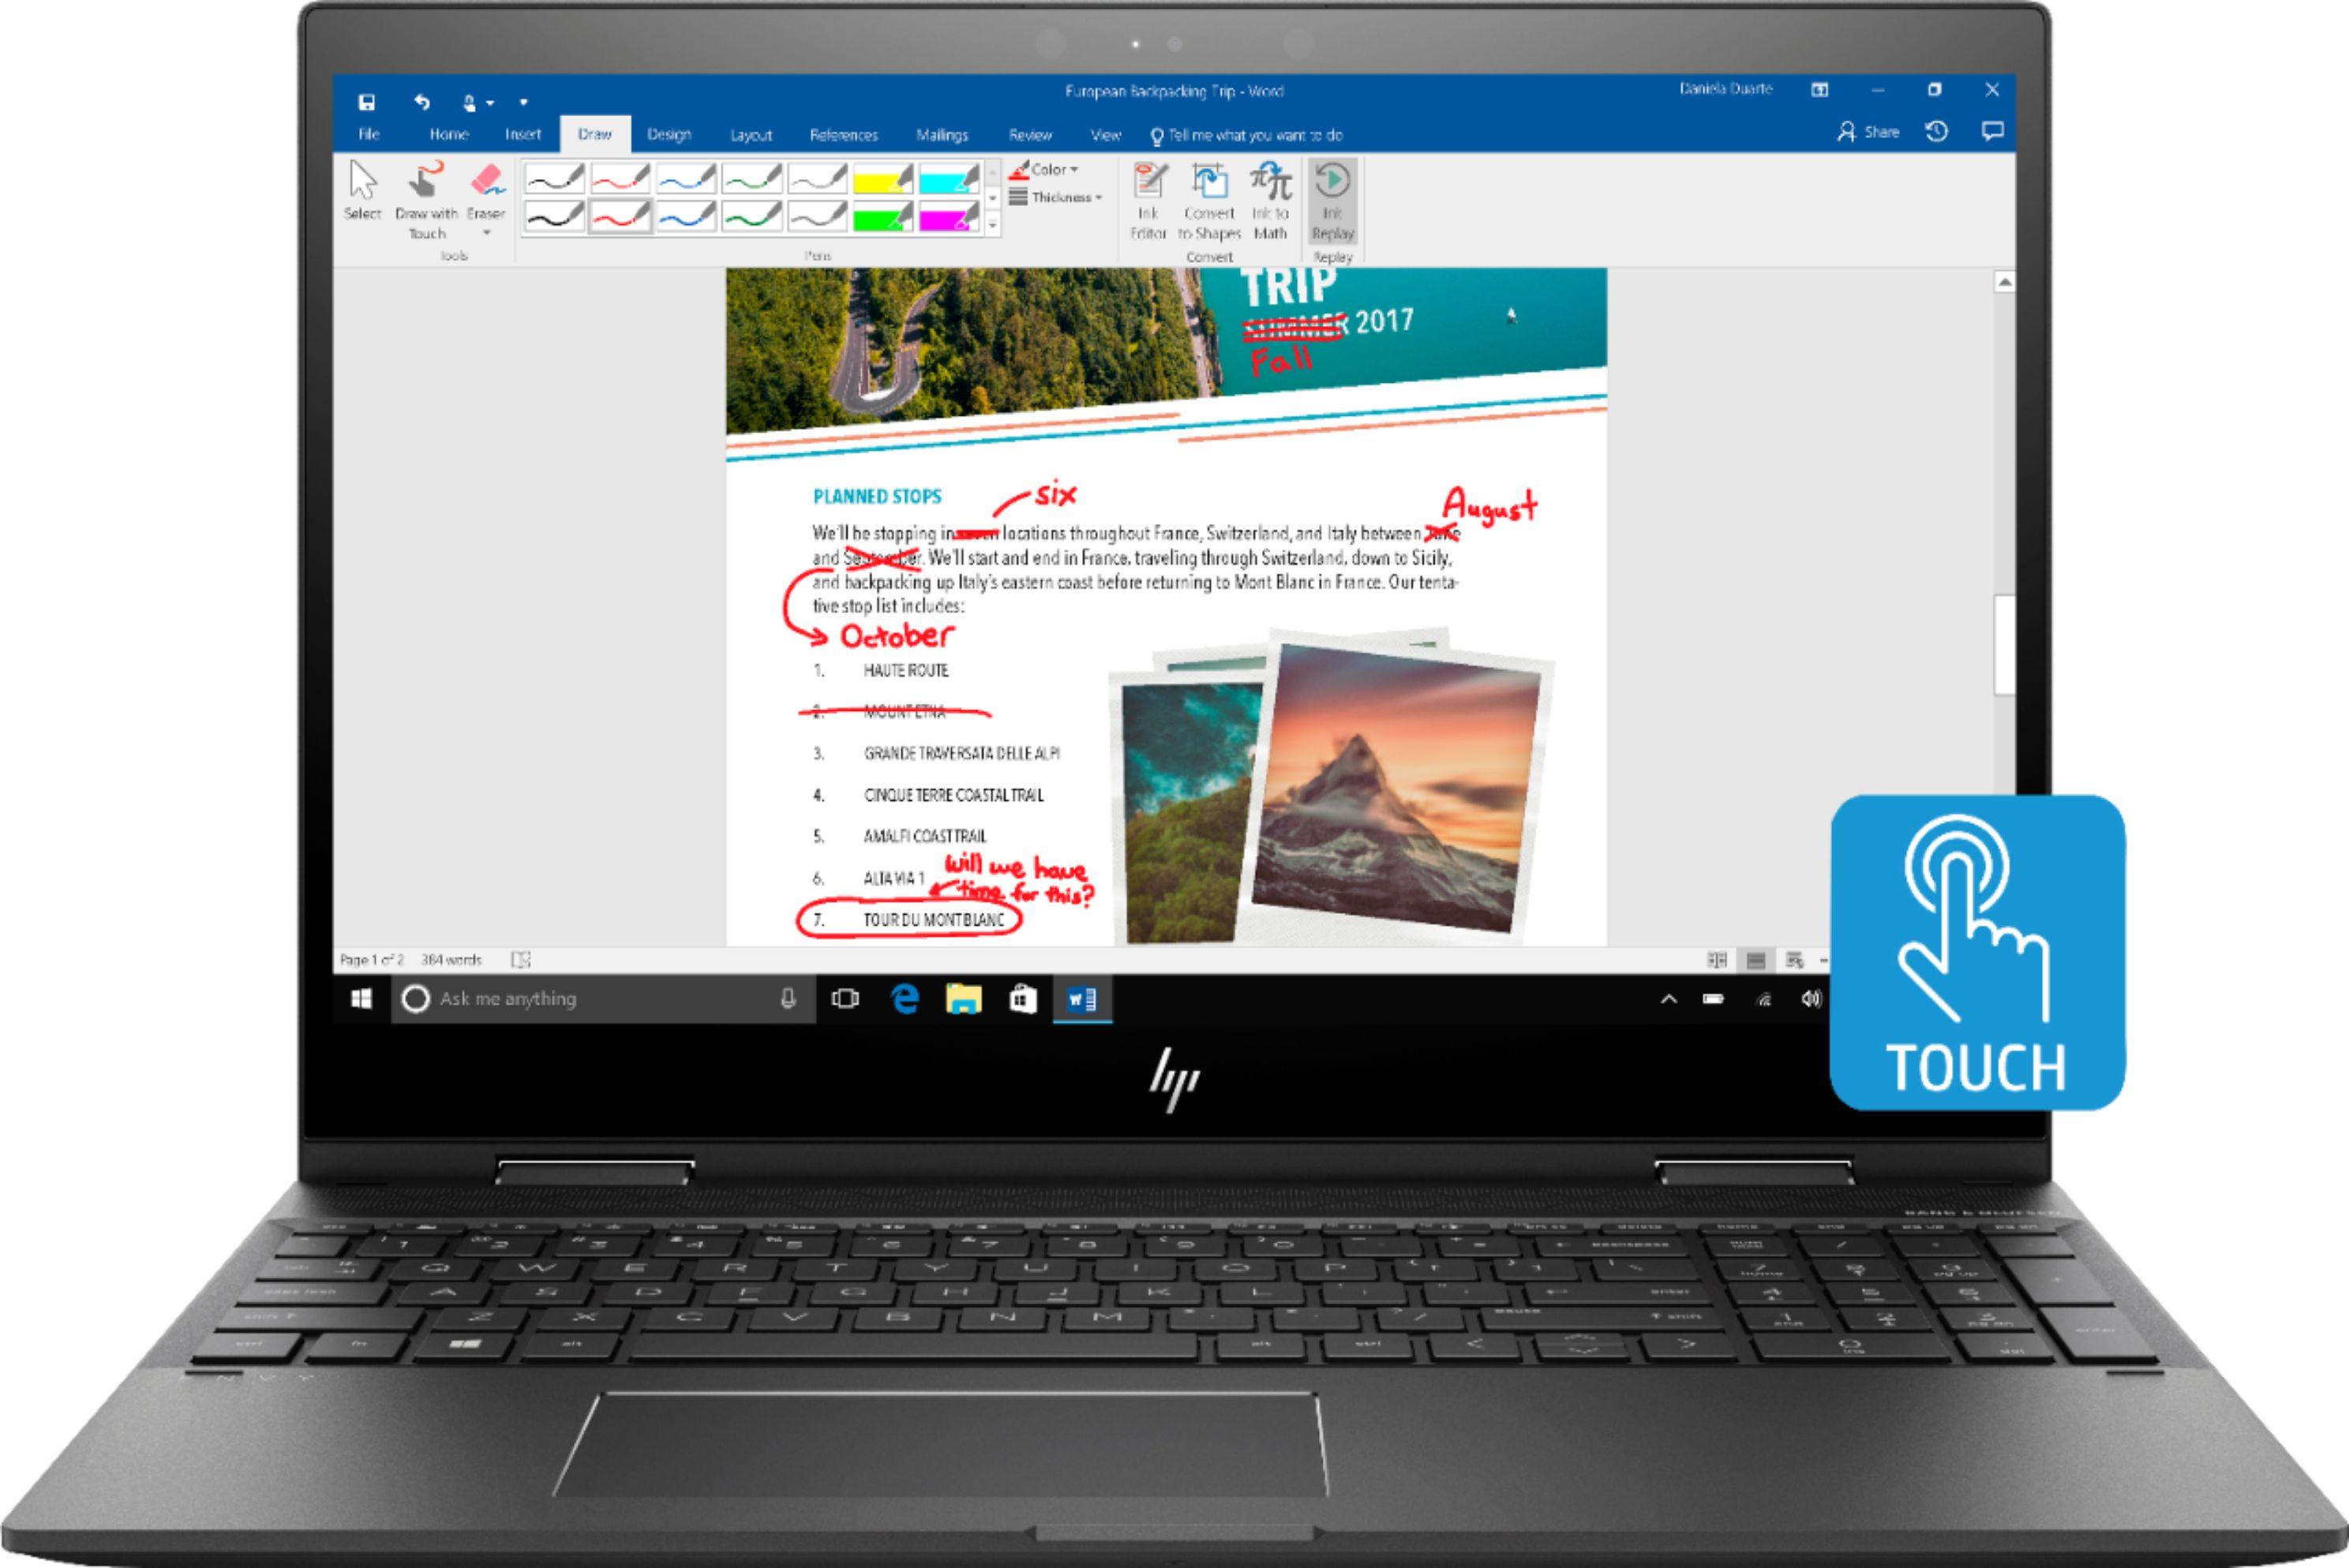 Hp Envy 2 In 1 15 6 Layar Sentuh Laptop Amd Ryzen 7 8 Gb Memori Amd Radeon Rx Vega 10 256 Gb Ssd B O Quad Speaker Gaming Laptop Aliexpress